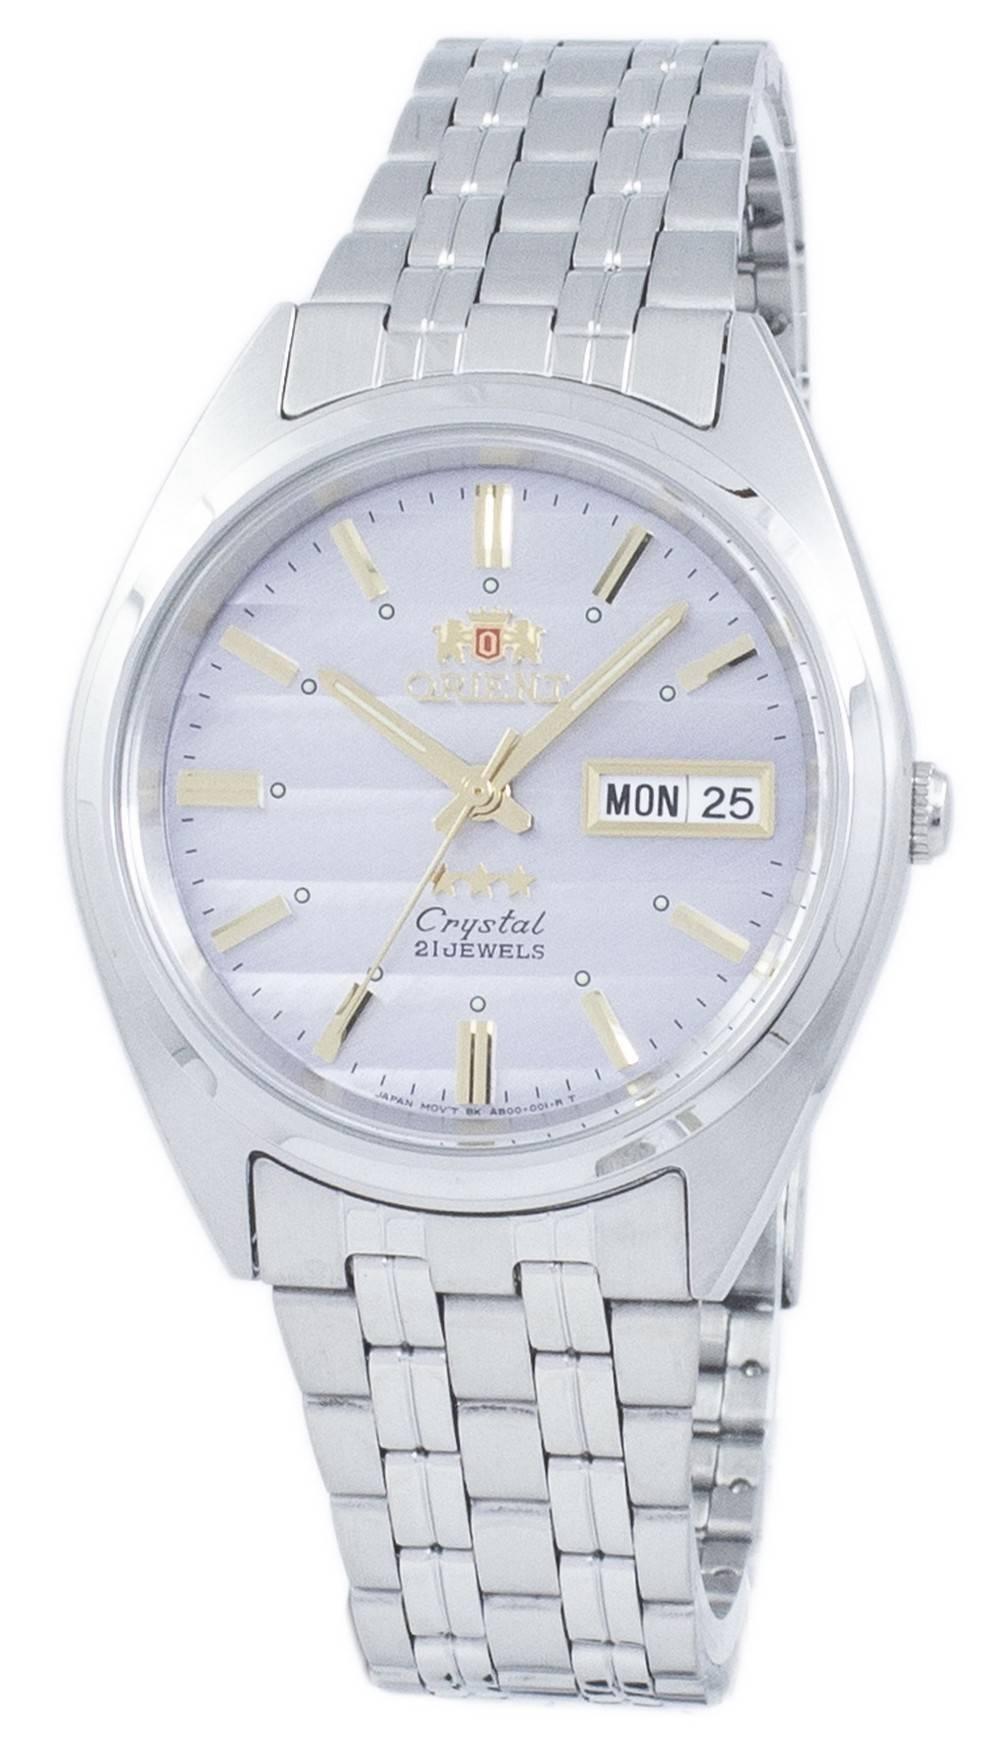 7212b50d358 Orient 3 Star Crystal Automatic FAB0000DK9 Mens Watch 751744859828 ...